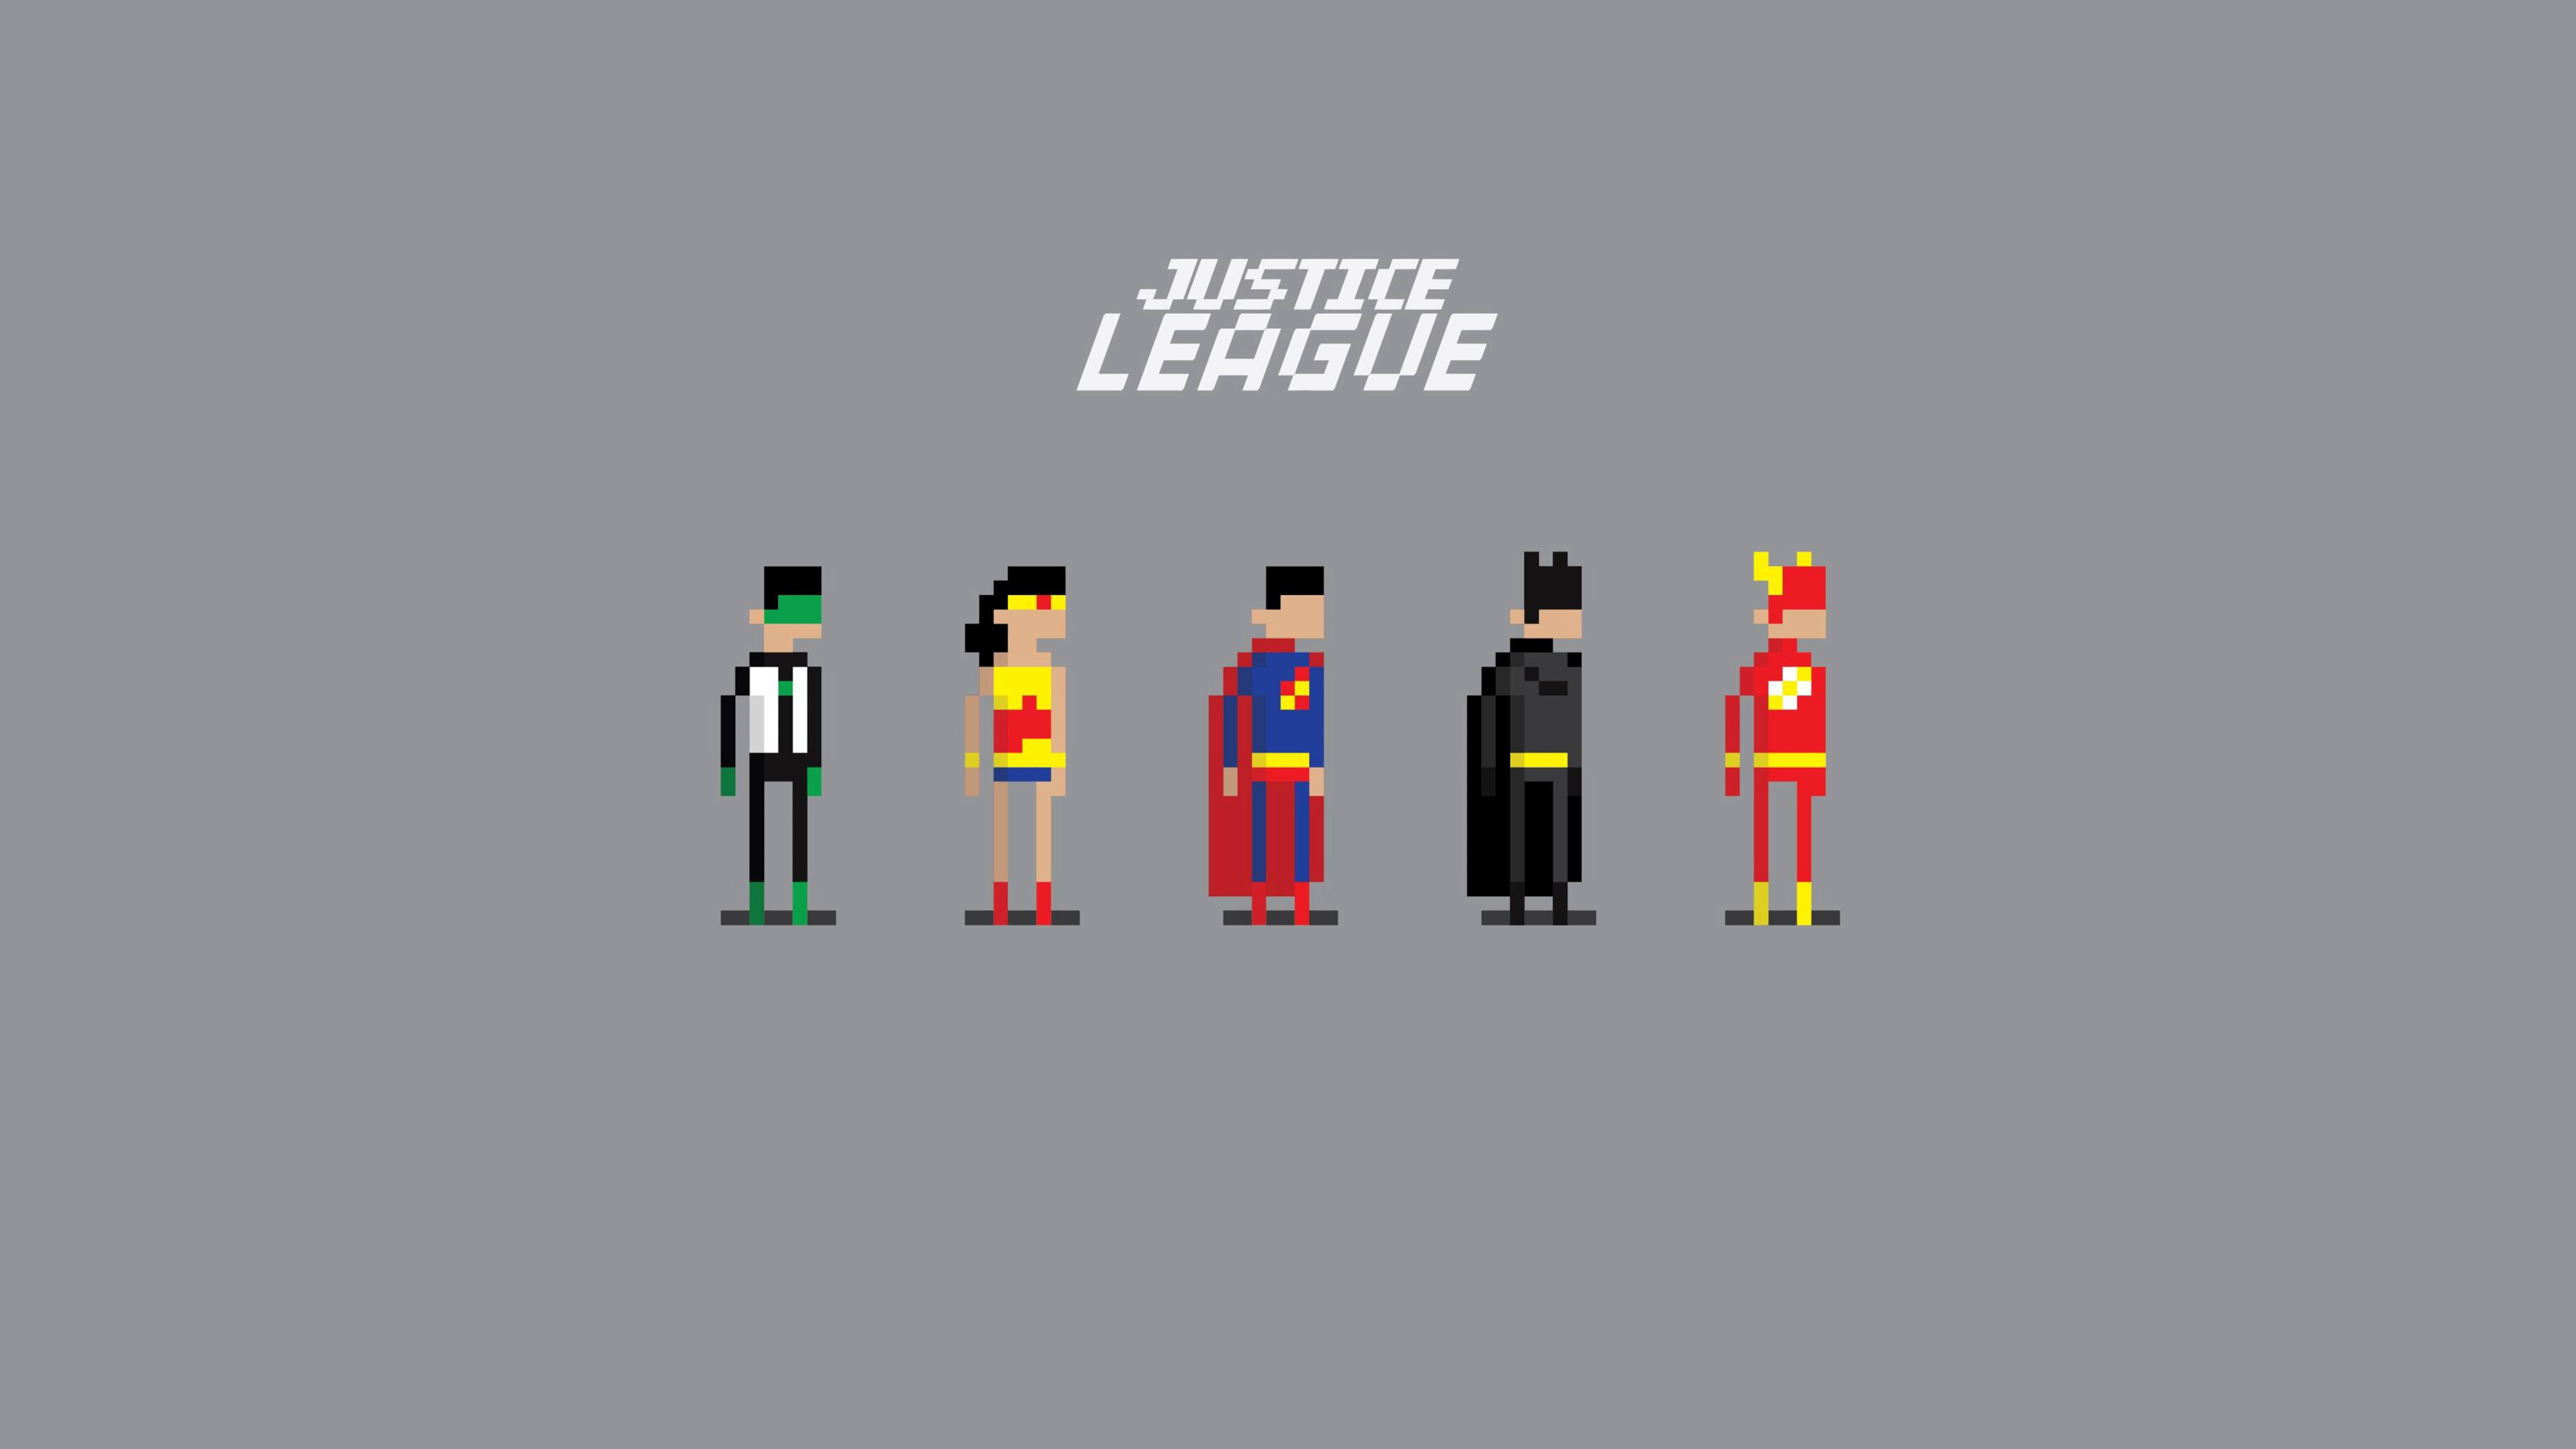 Anime Lock Screen Wallpaper Justice League 8 Bit Hd Superheroes 4k Wallpapers